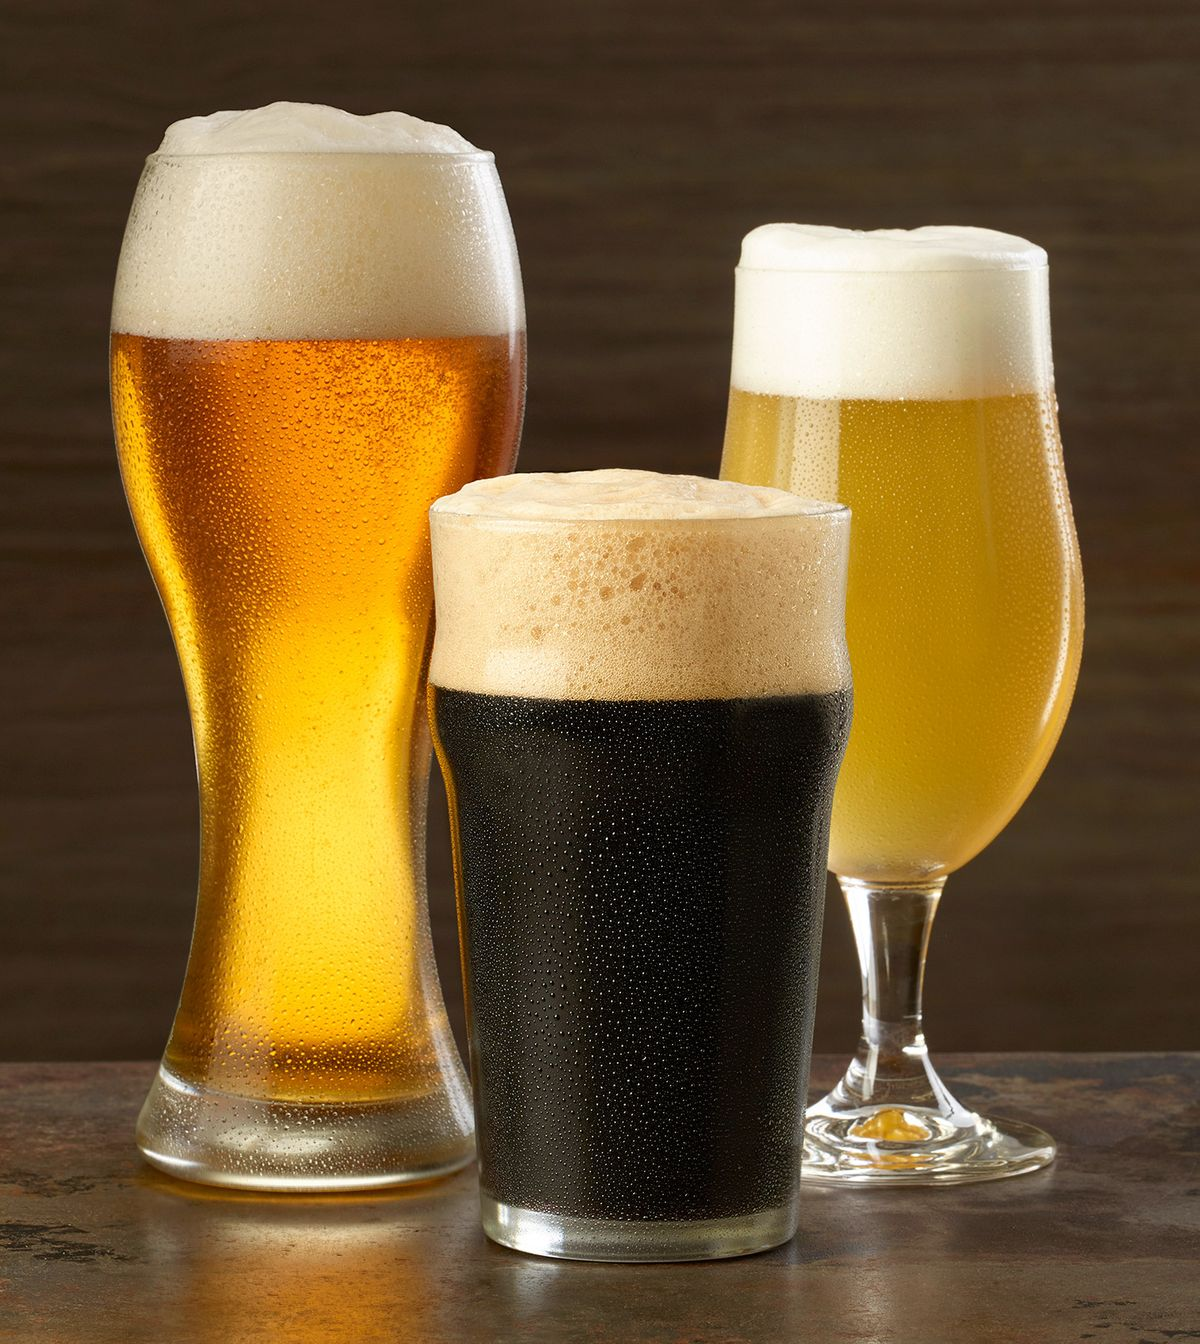 DFW_Airport_trio_craft-beer.jpg